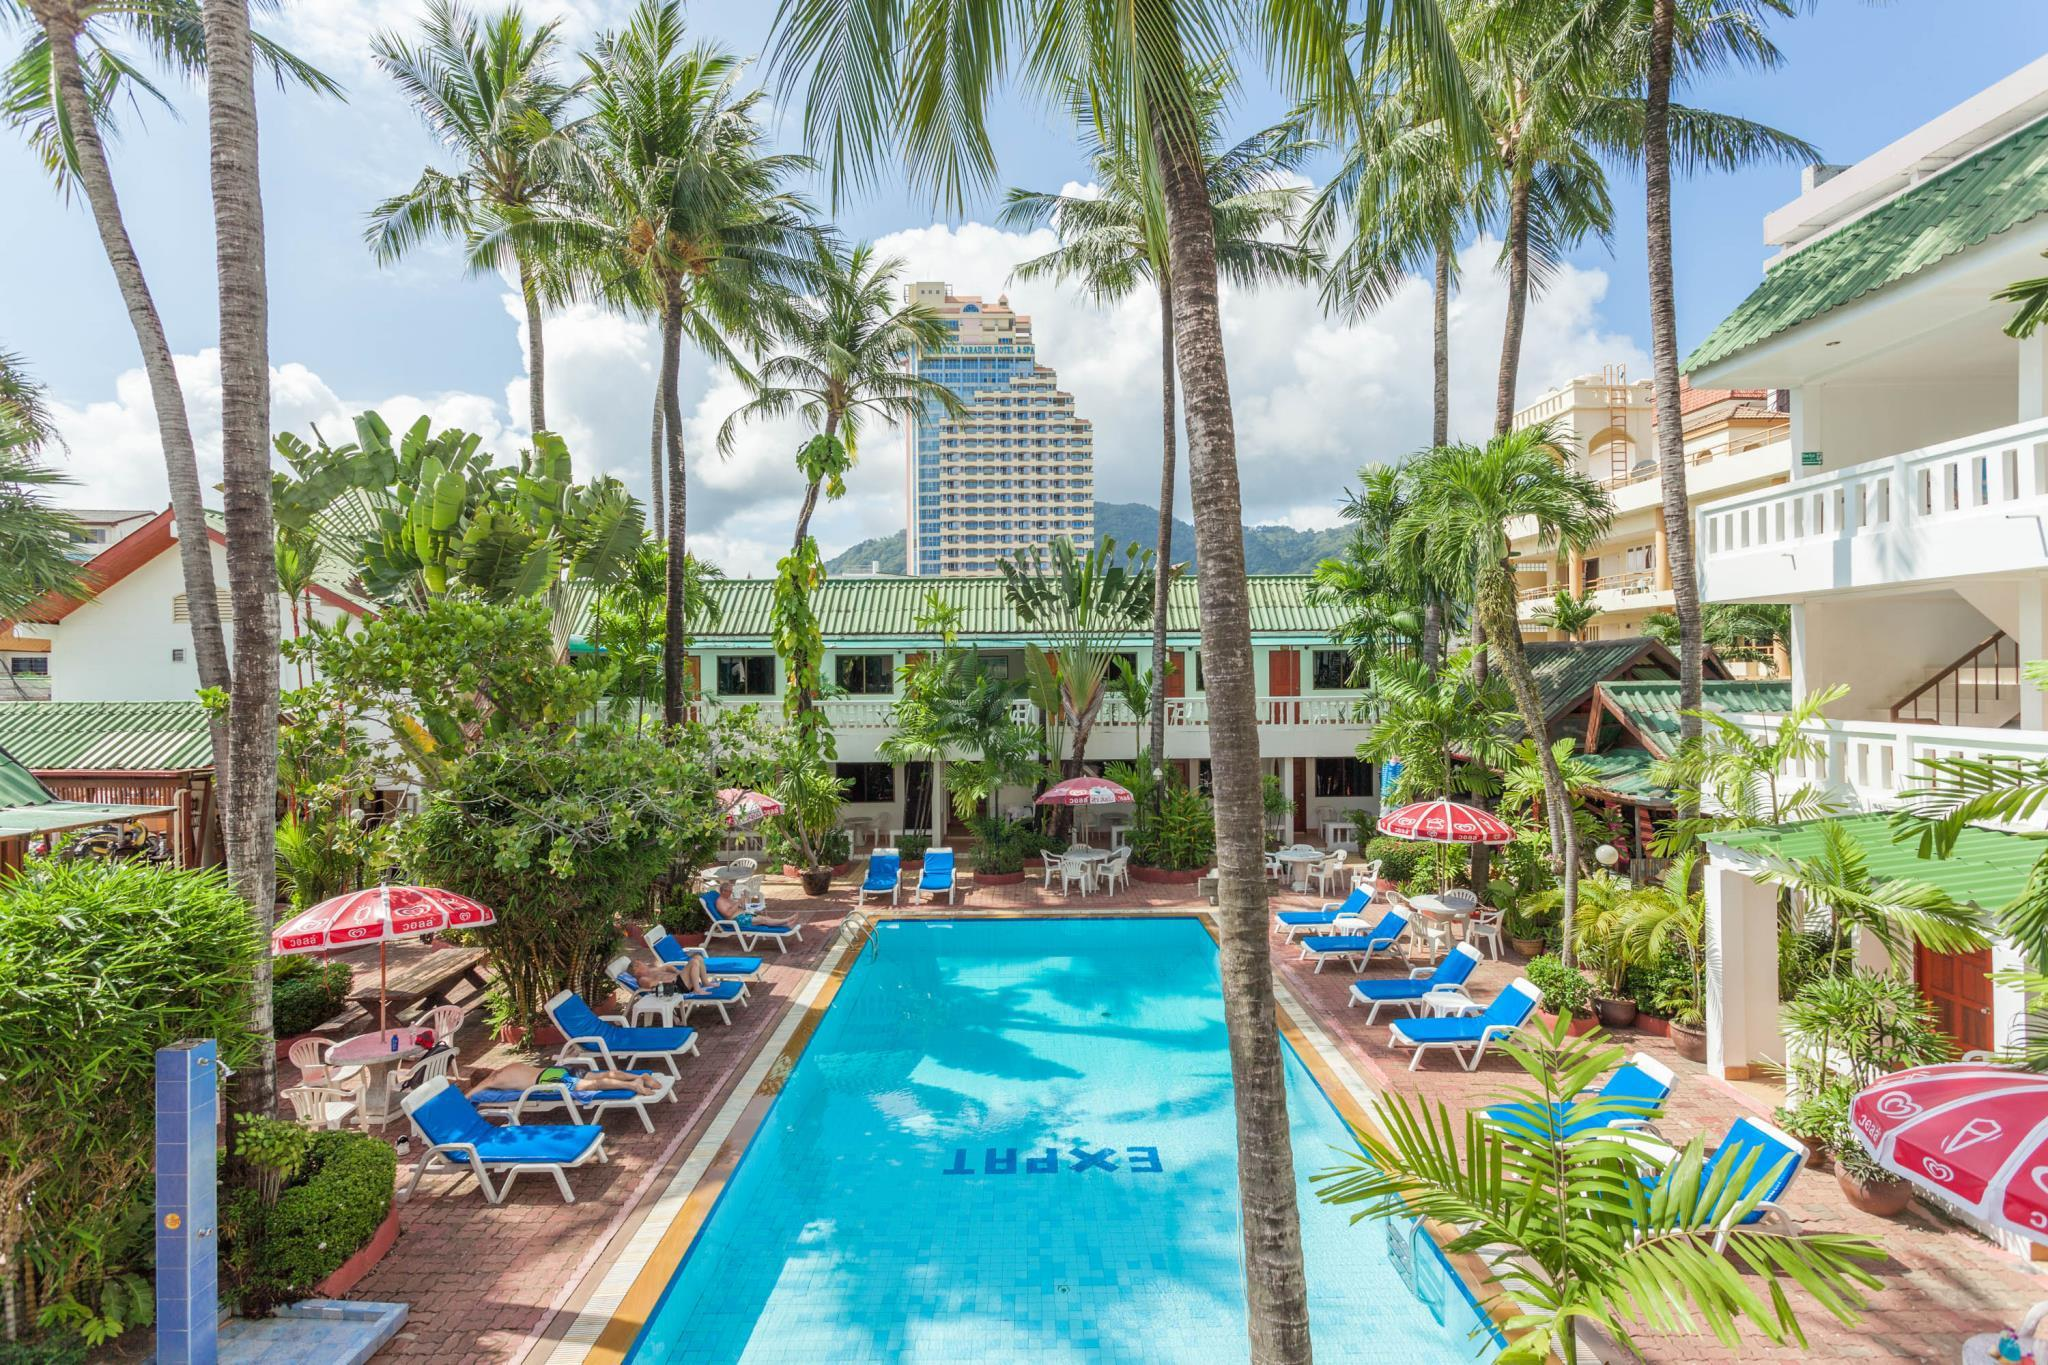 Expat Hotel โรงแรมเอ็กซ์แพท